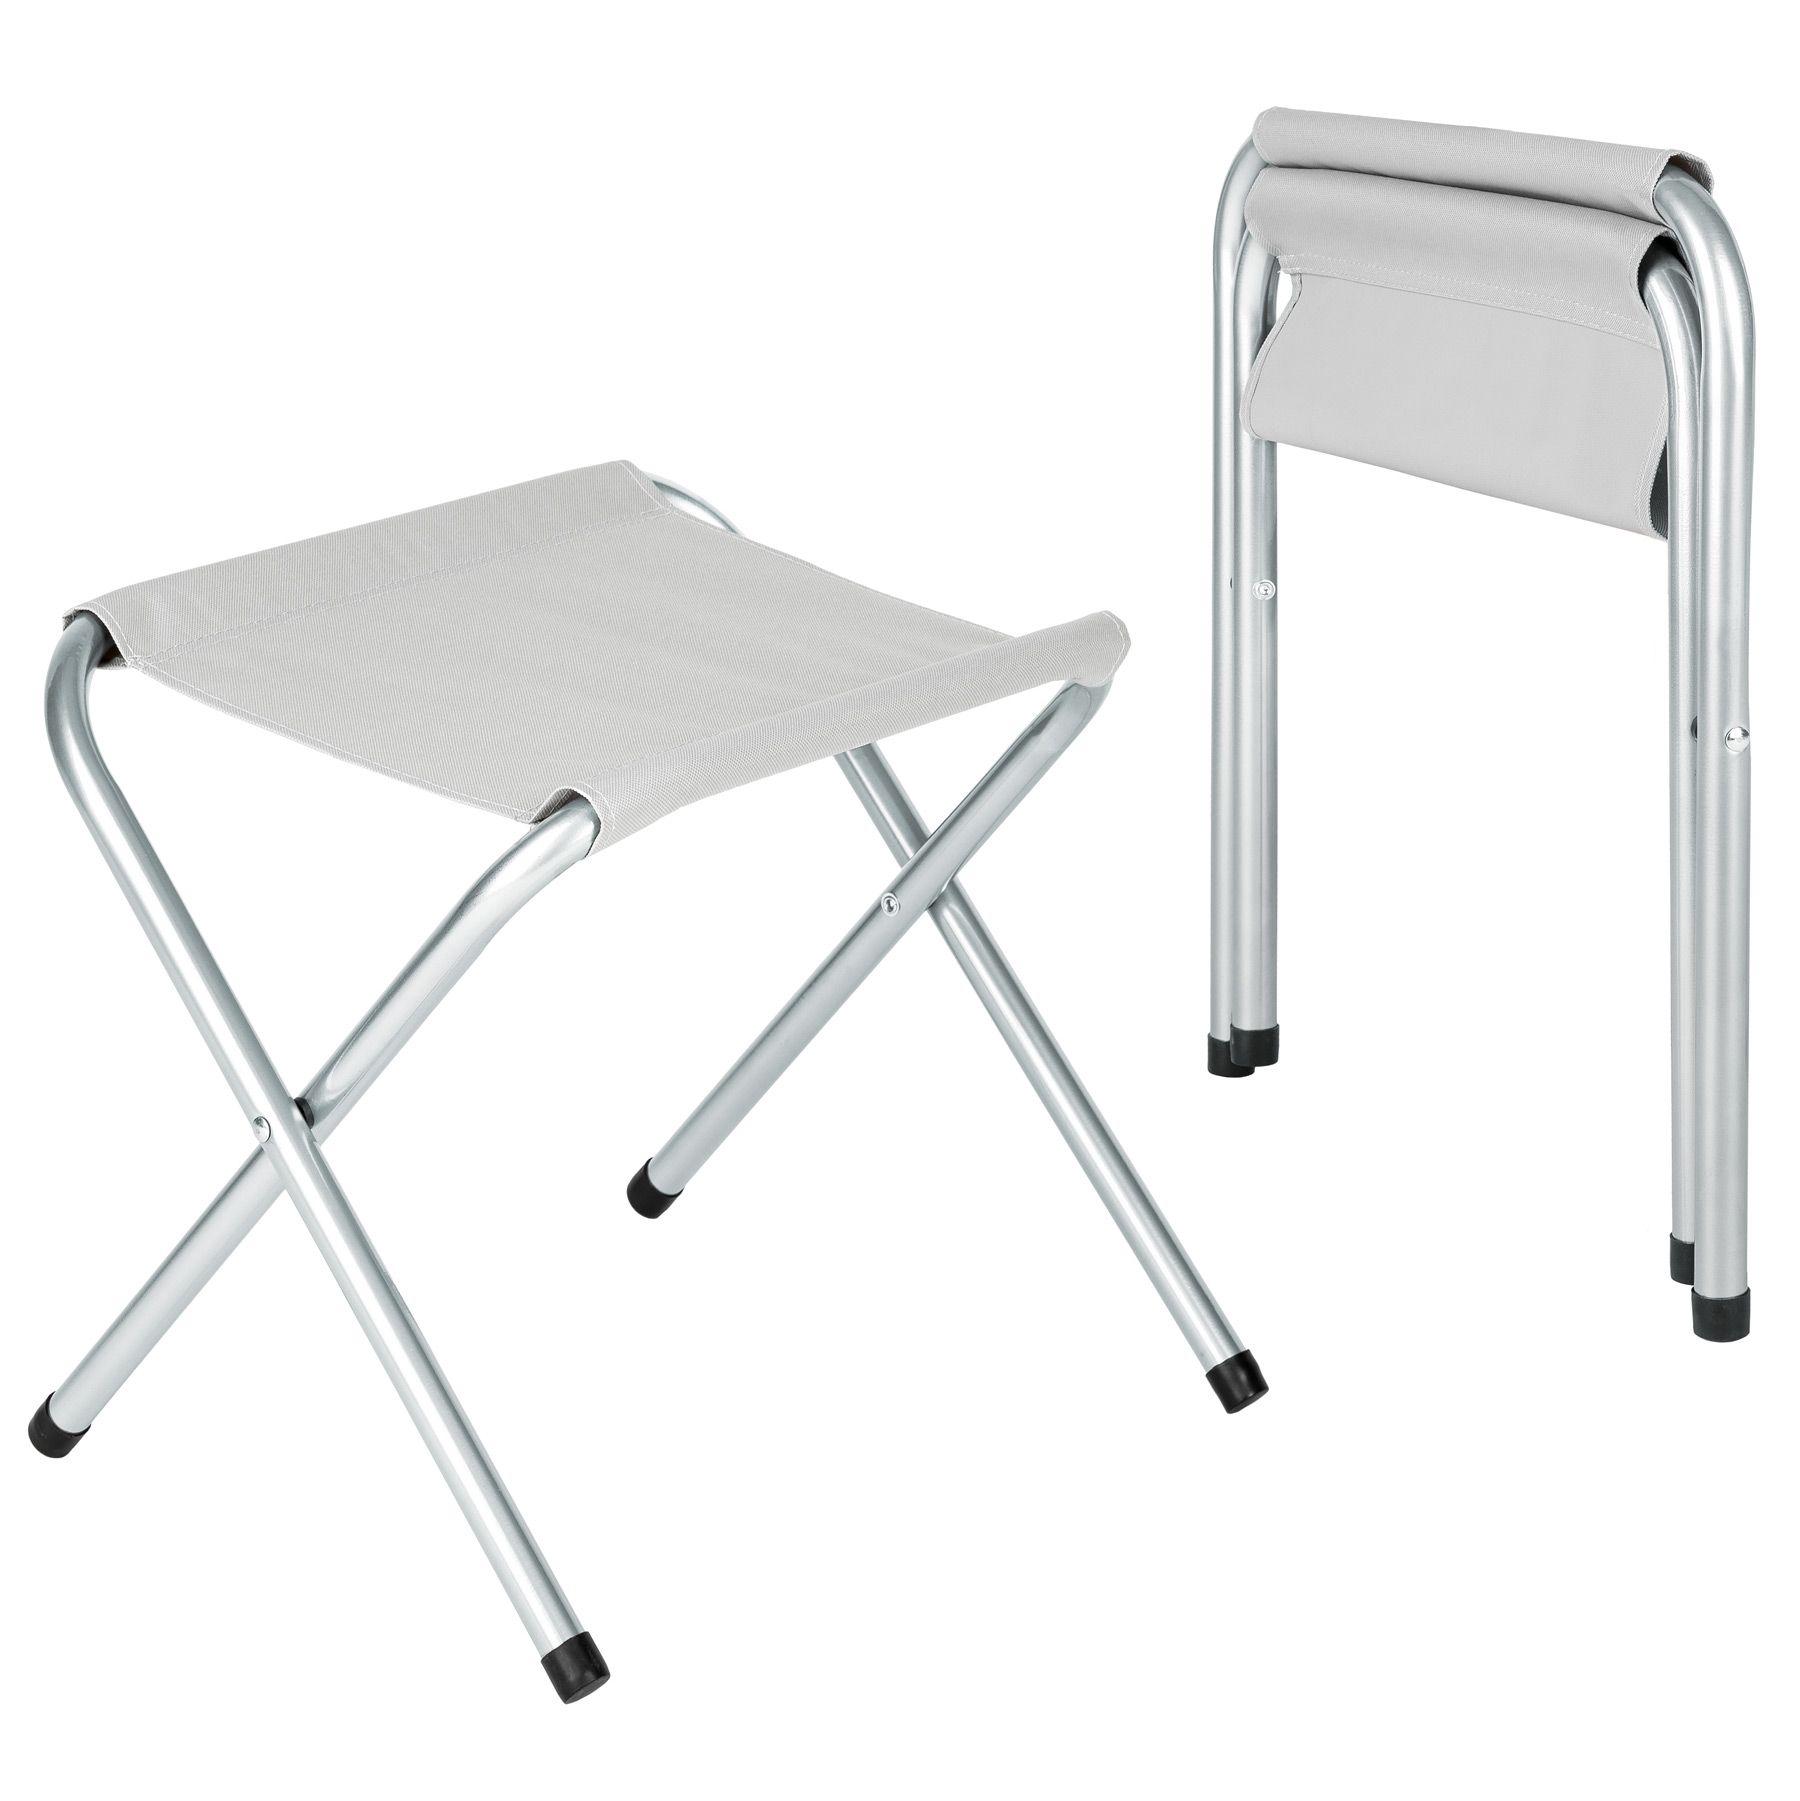 eensemble table pliante valise avec 4 tabourets camping aluminium pique nique ebay. Black Bedroom Furniture Sets. Home Design Ideas